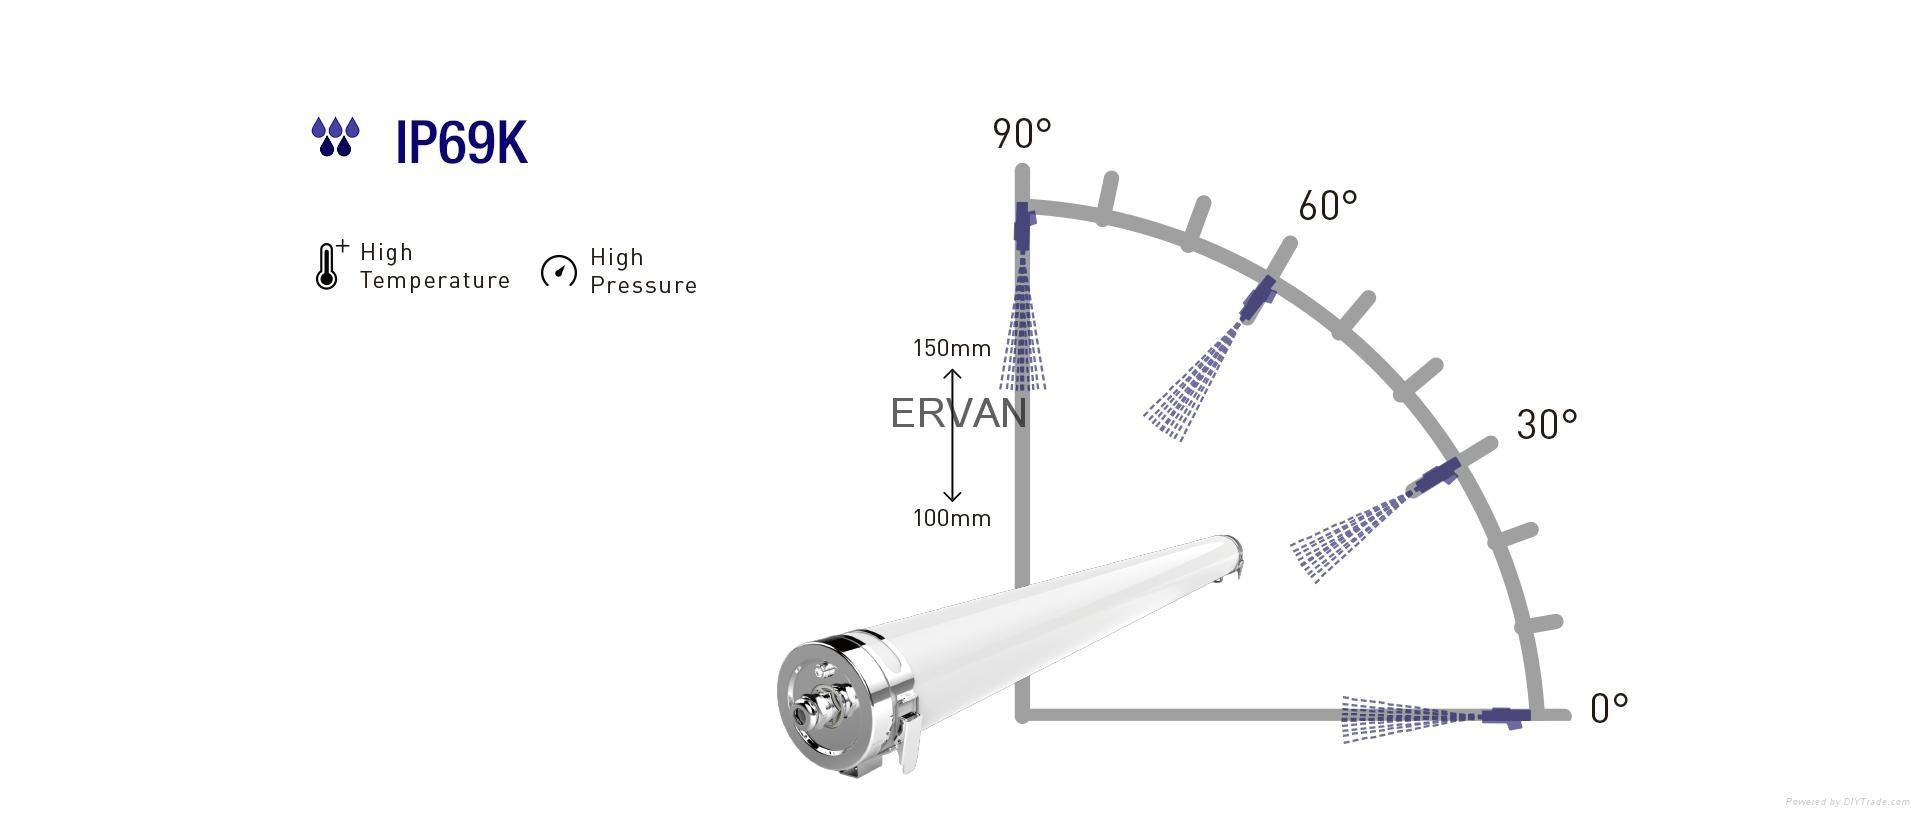 ip69k rancher luminaire tubular 1500mm 48w - t60